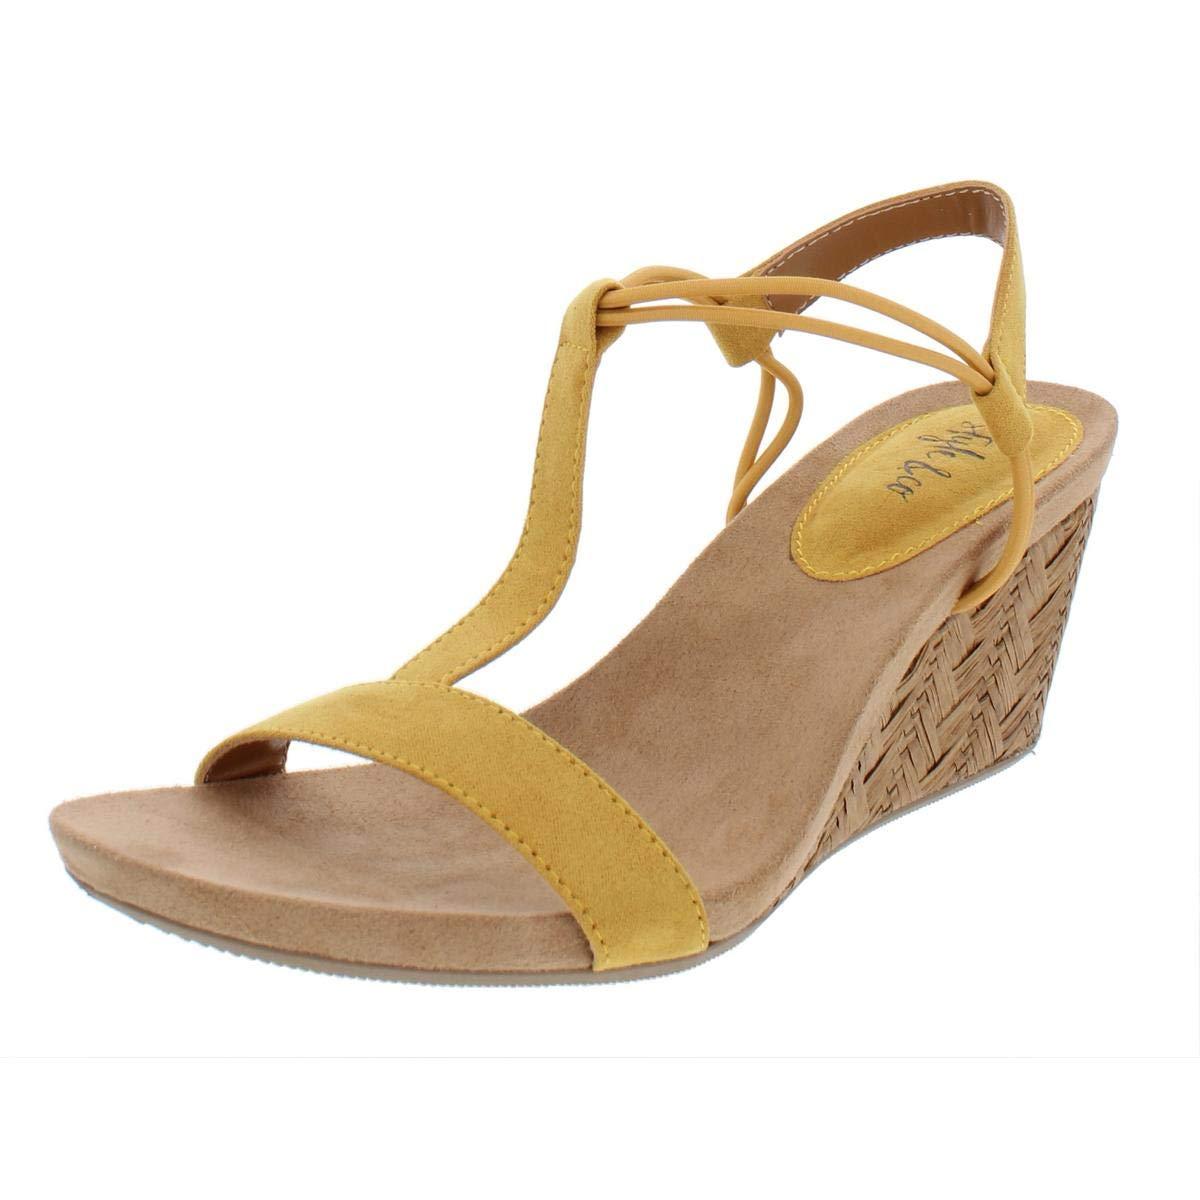 d06b488dd3 Womens Mulan Faux Suede Wedges T-Strap Sandals Yellow 5 Medium (B, M)    Heeled Sandals